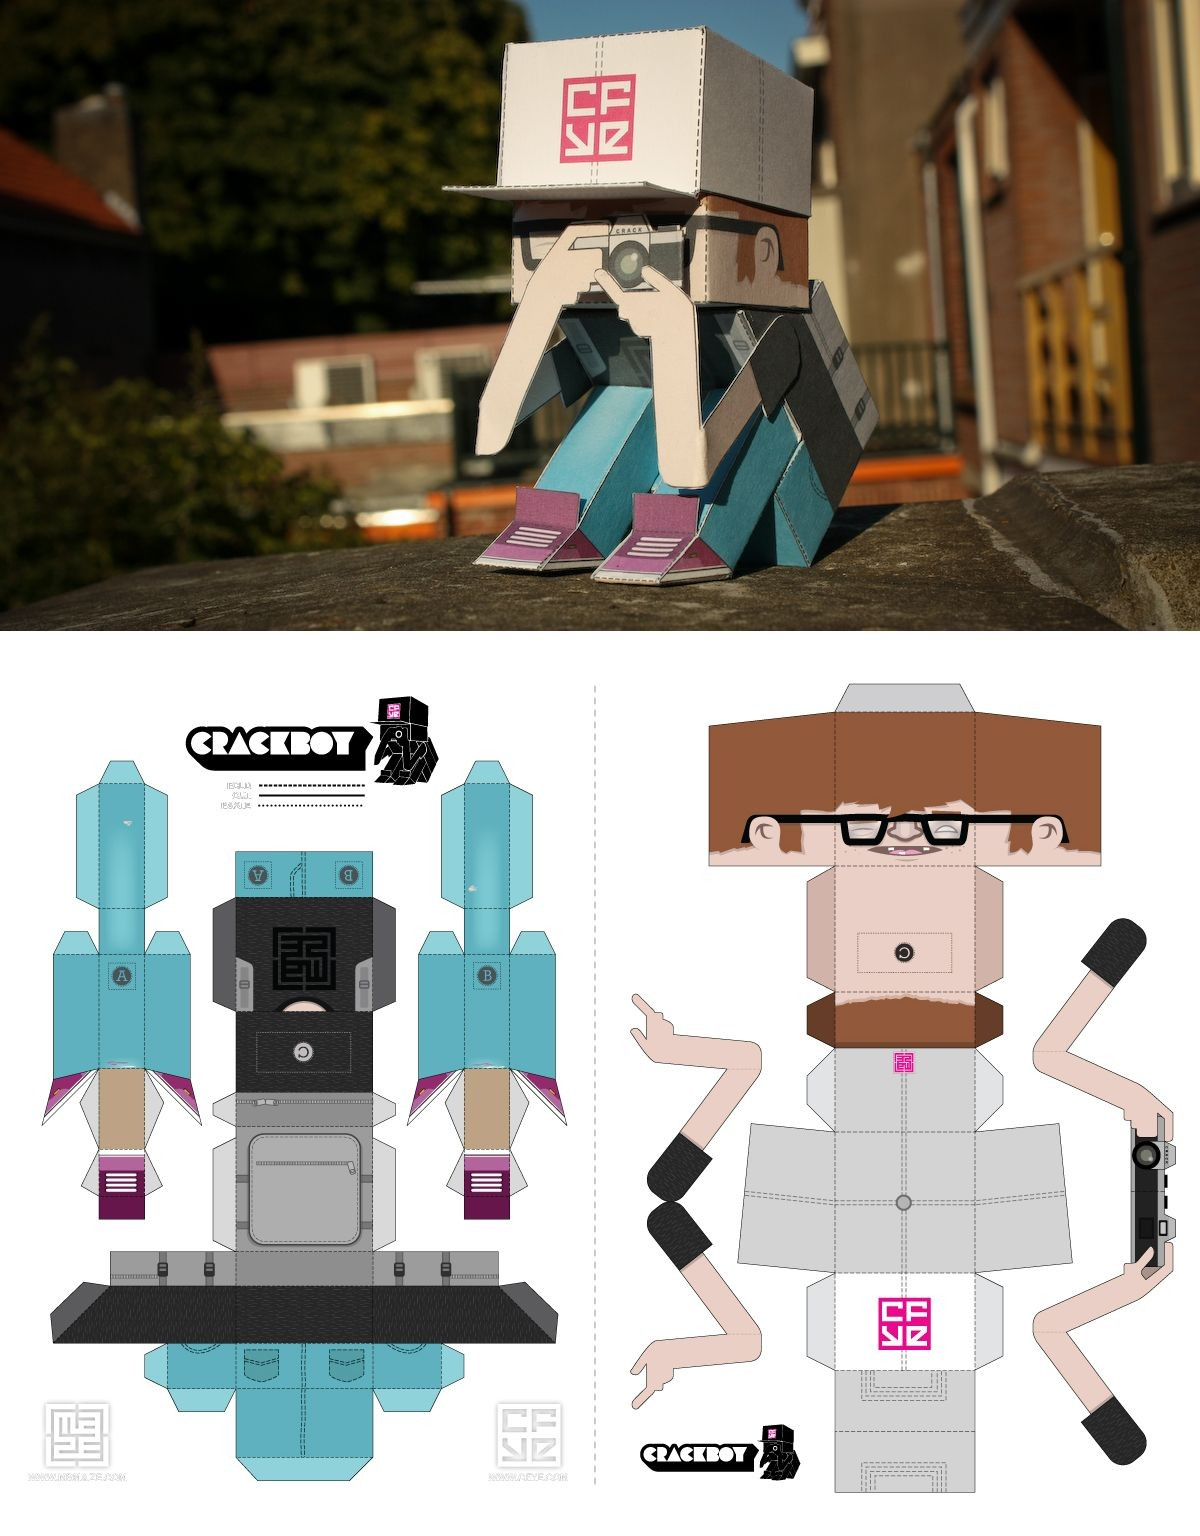 Papercraft Stormtrooper Papertoy Cfye Crackboy Paper Crafts 13 Pinterest